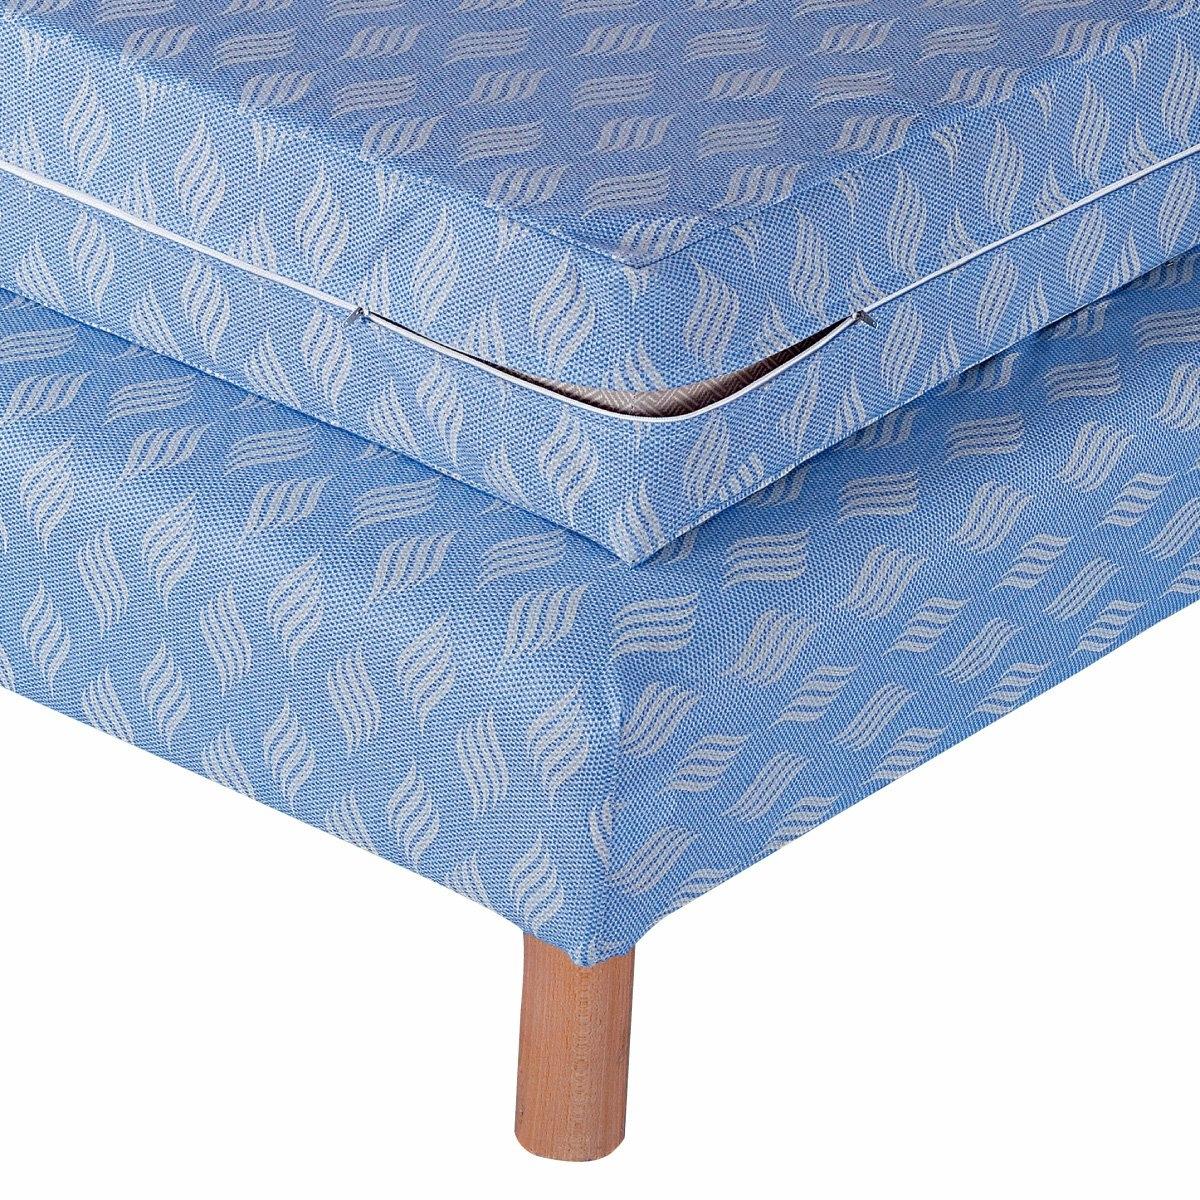 Чехол LaRedoute Для кровати 140 x 190 см синий чехол laredoute для кровати из льна touril 140 x 190 см серый